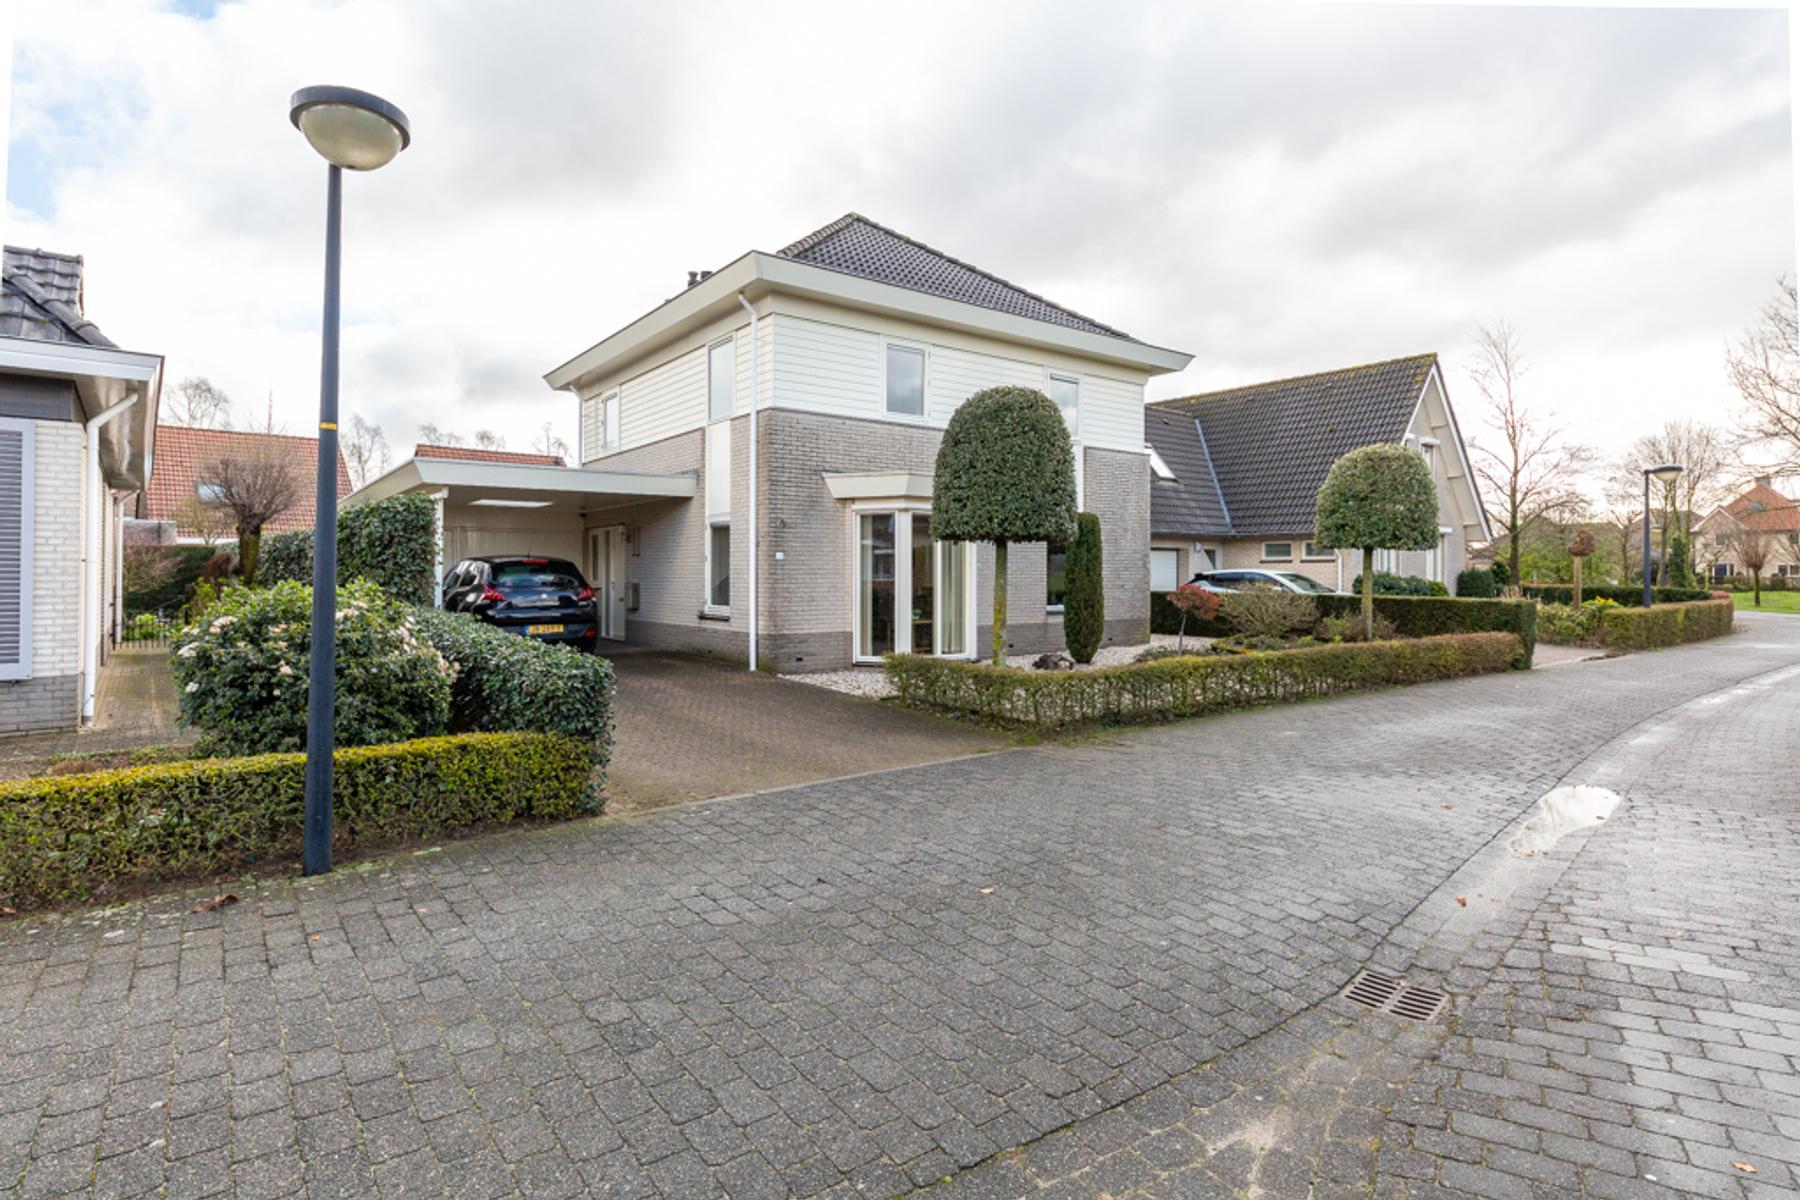 Loiredal 10 in Doetinchem 7007 HL